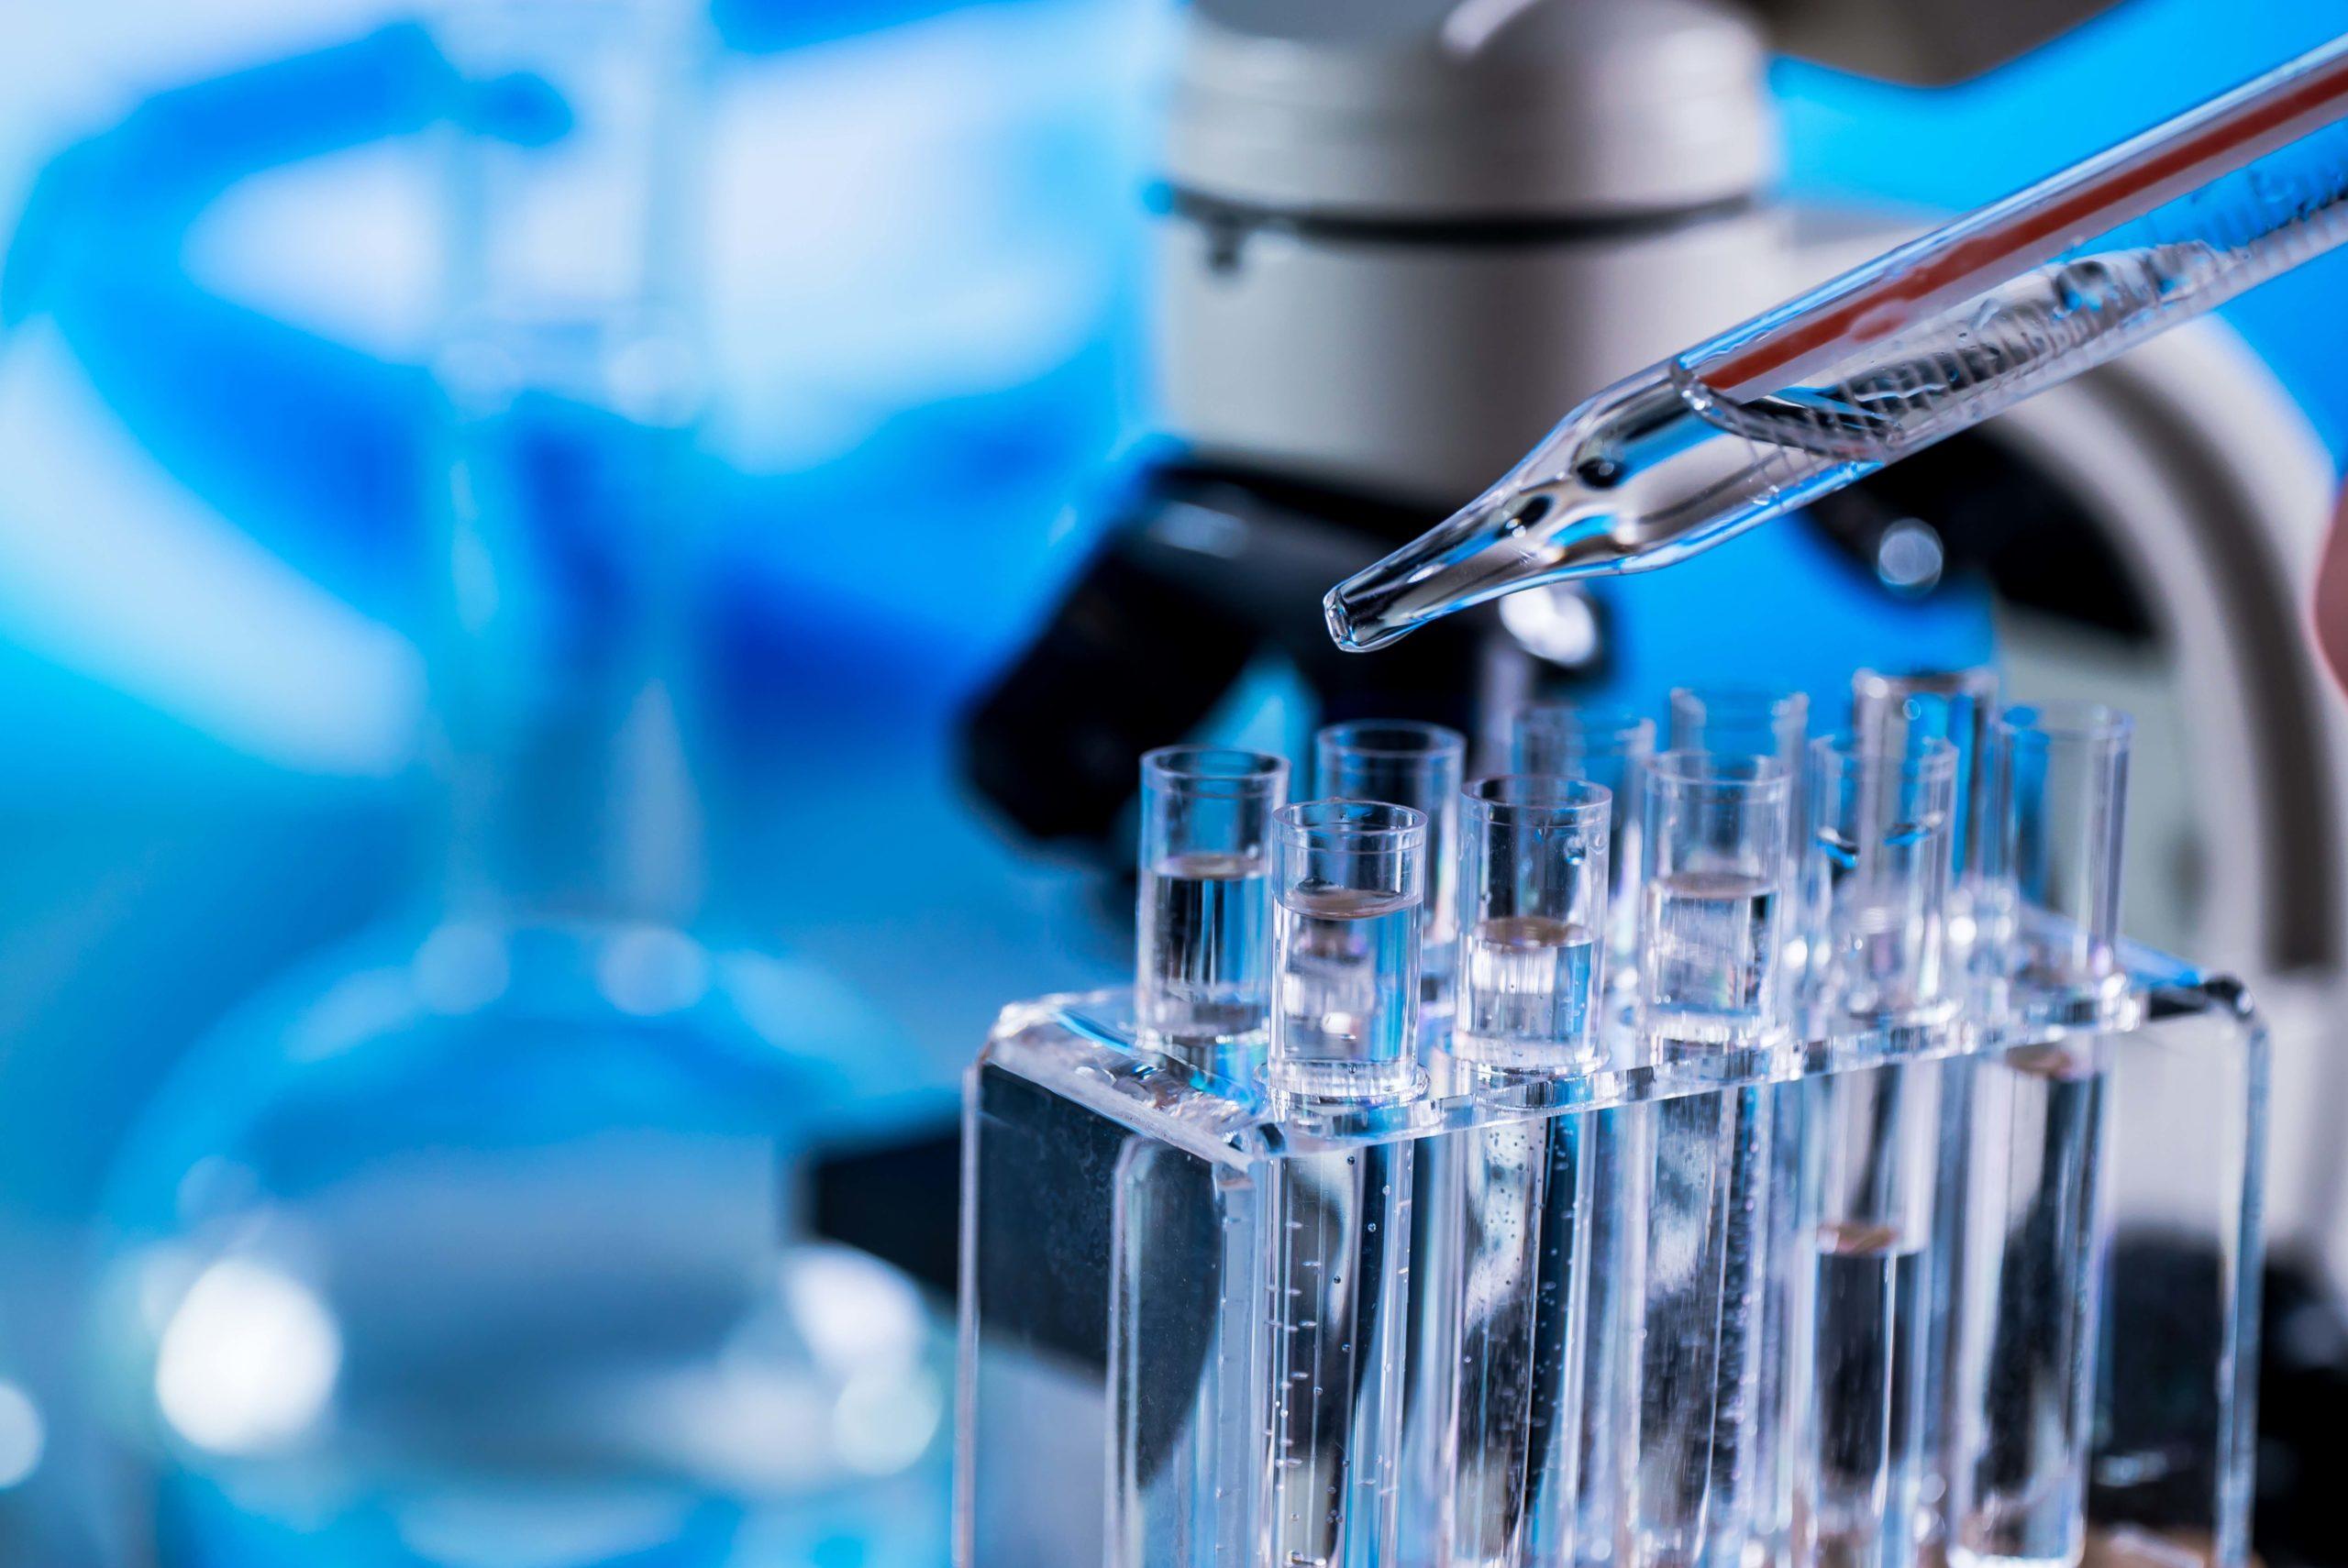 Science laboratory research and development concept. microscope